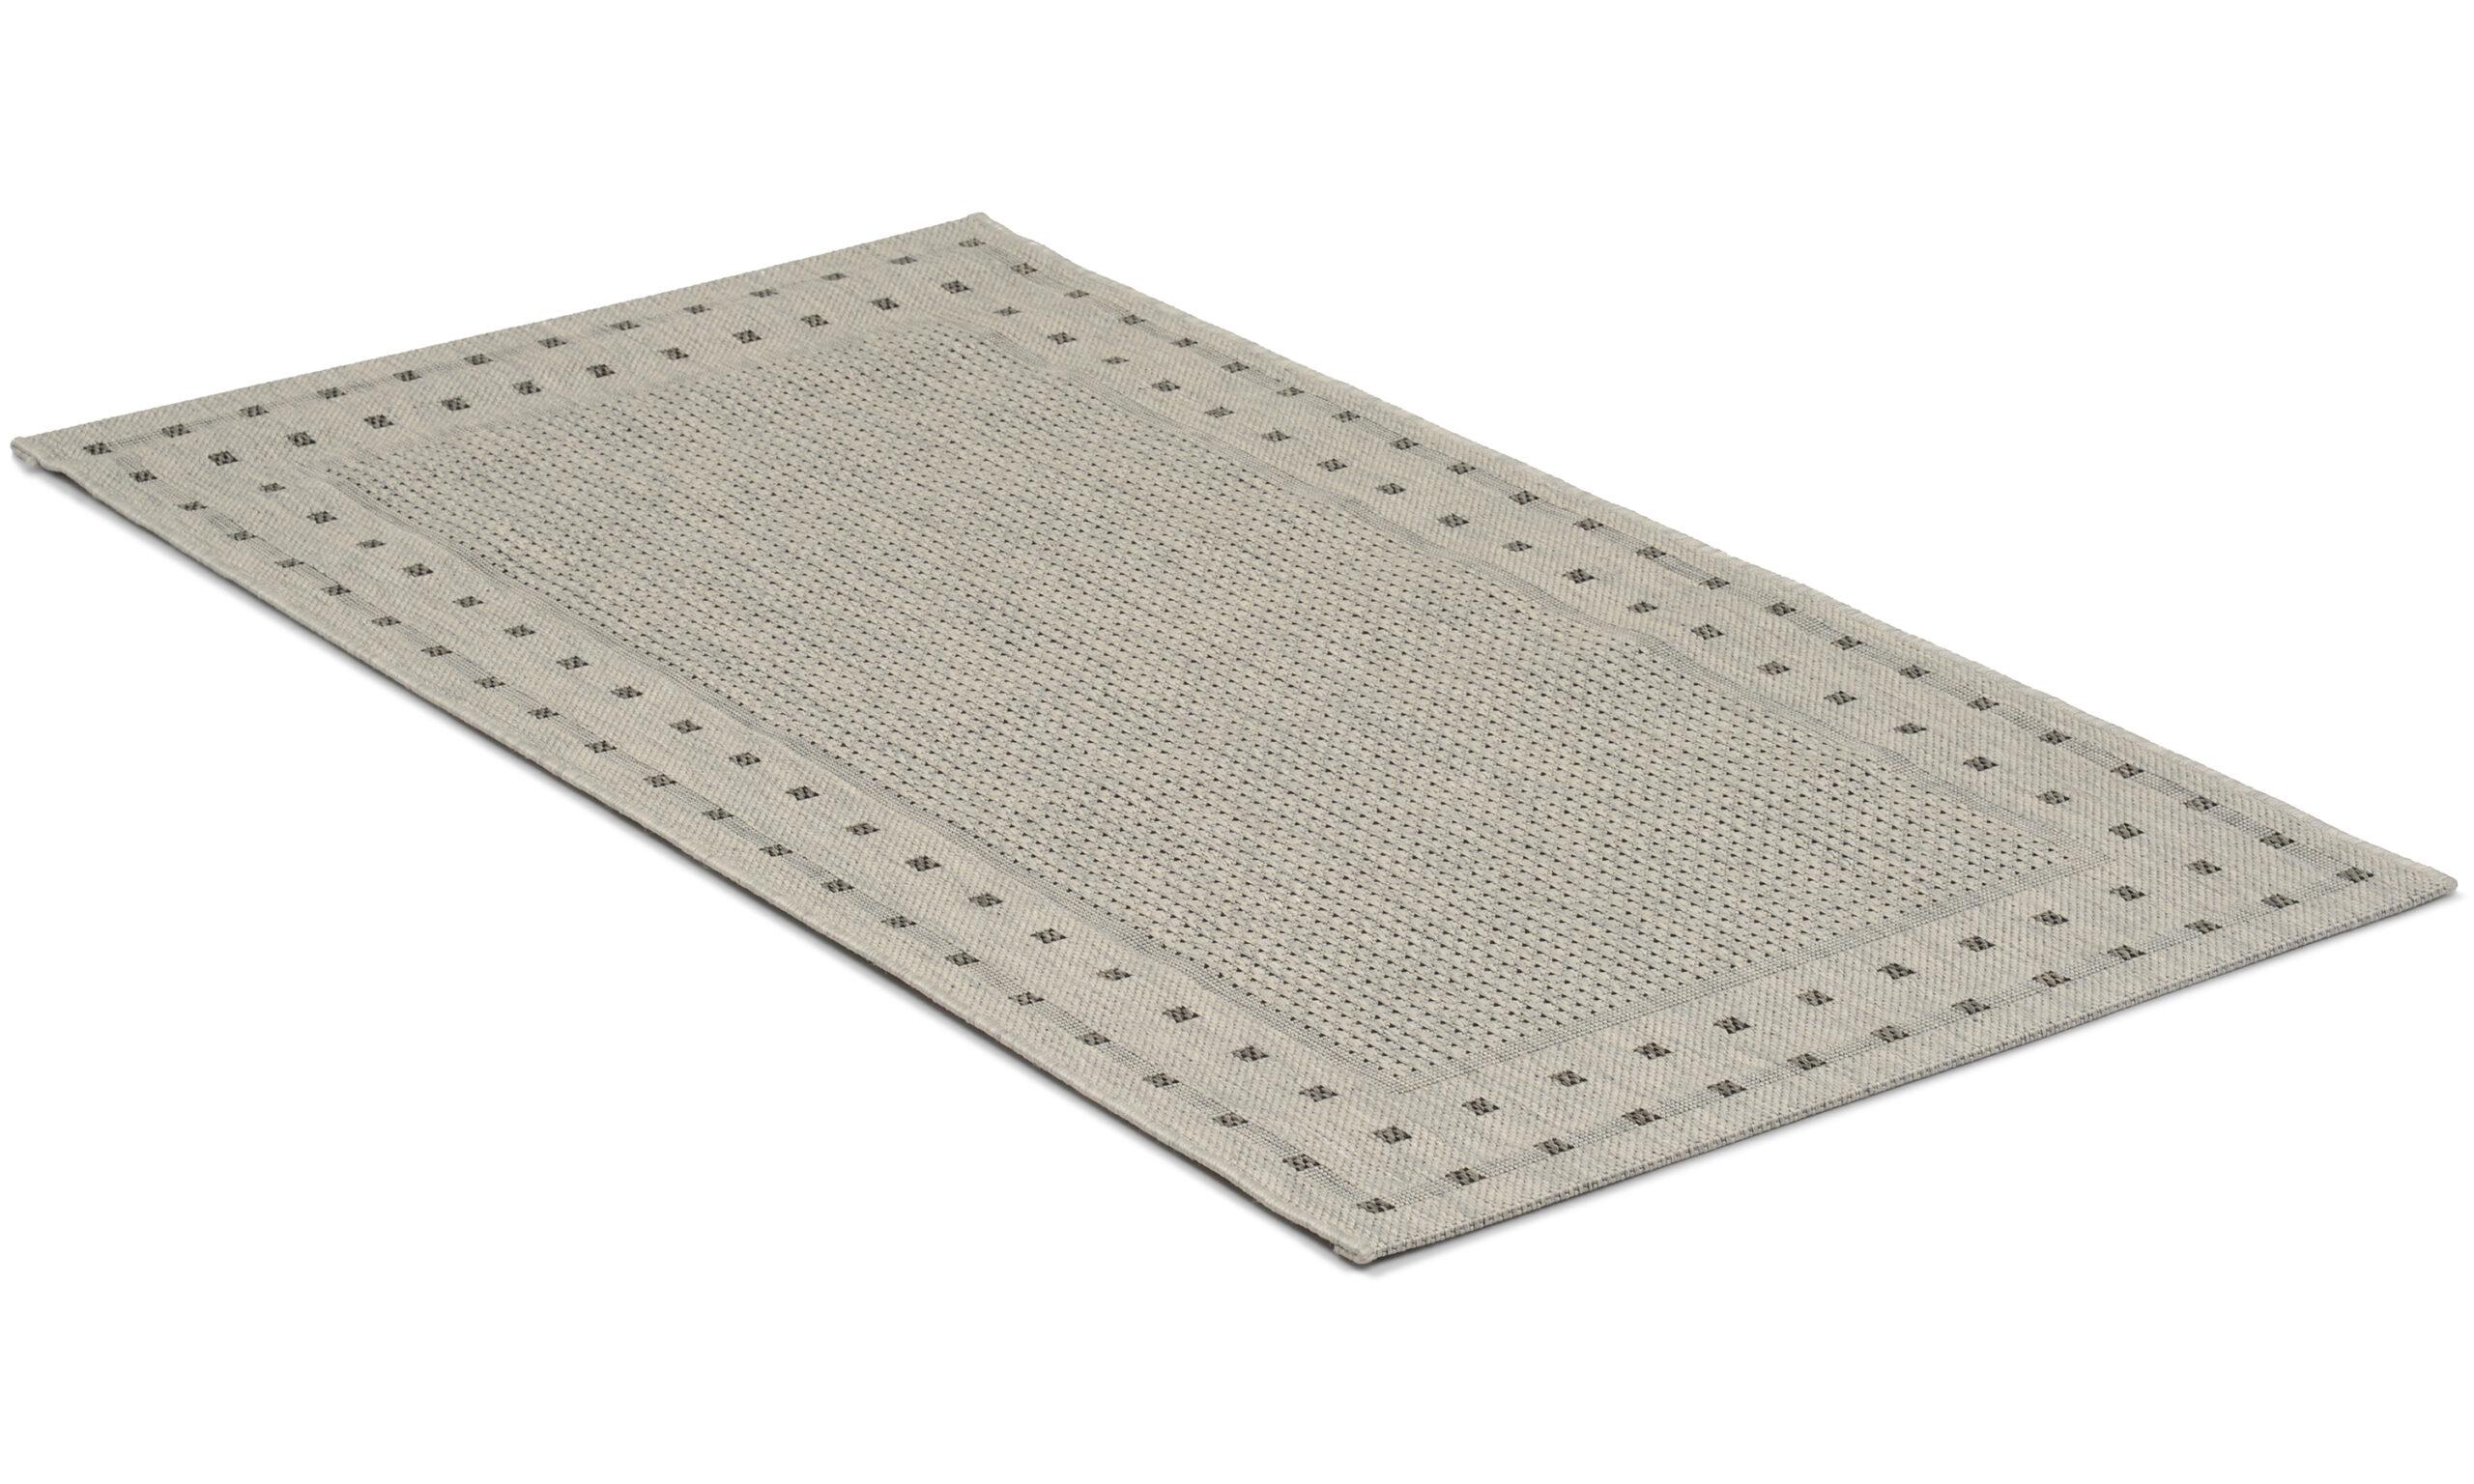 Rut lysegrå - flatvevd teppe